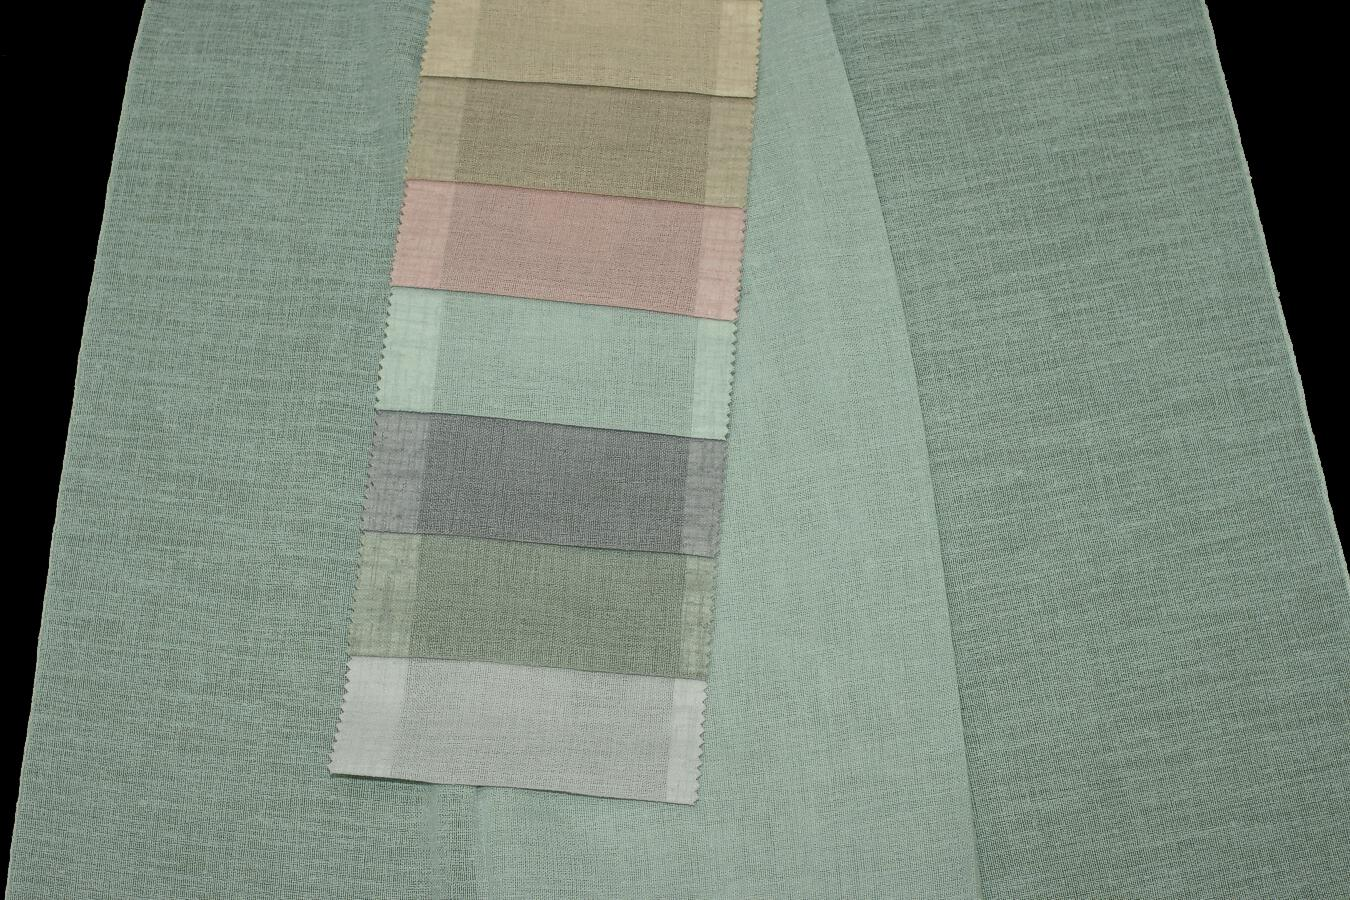 Záclona 31347 Turchese 320 cm s olůvkem 77 růžová